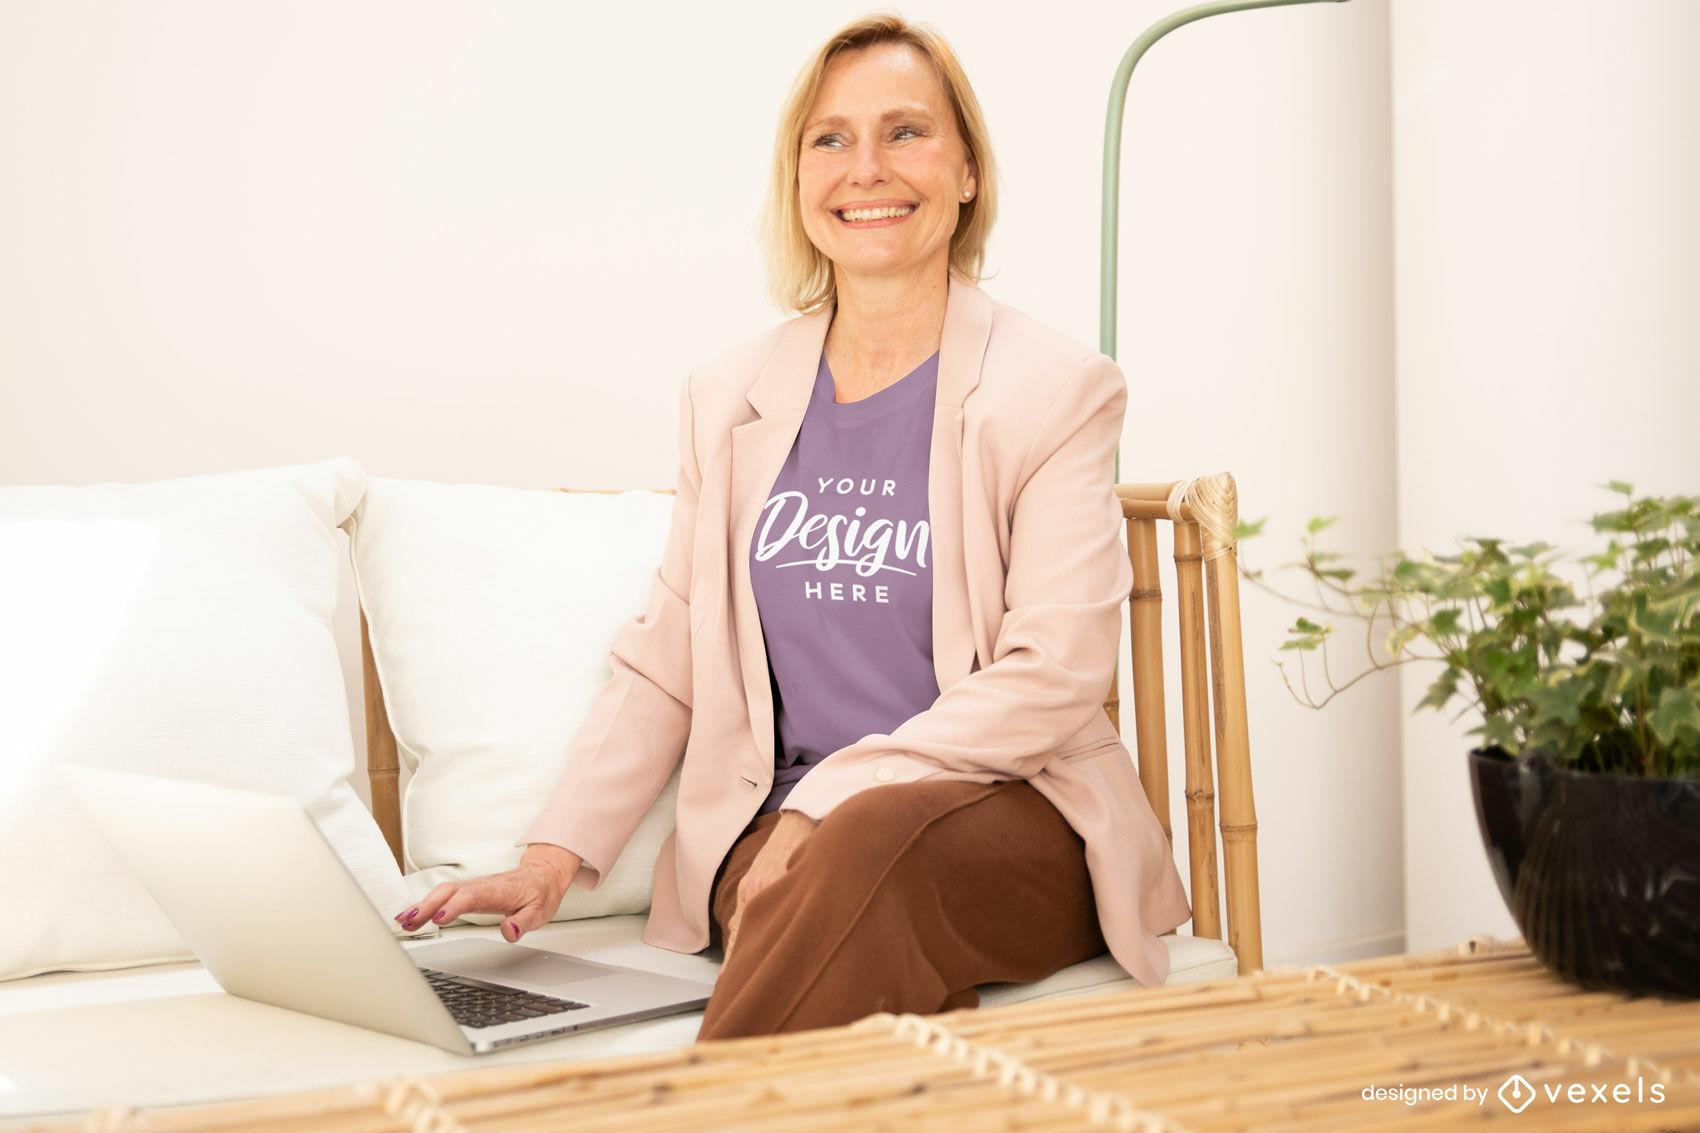 Woman in purple t-shirt in living room mockup